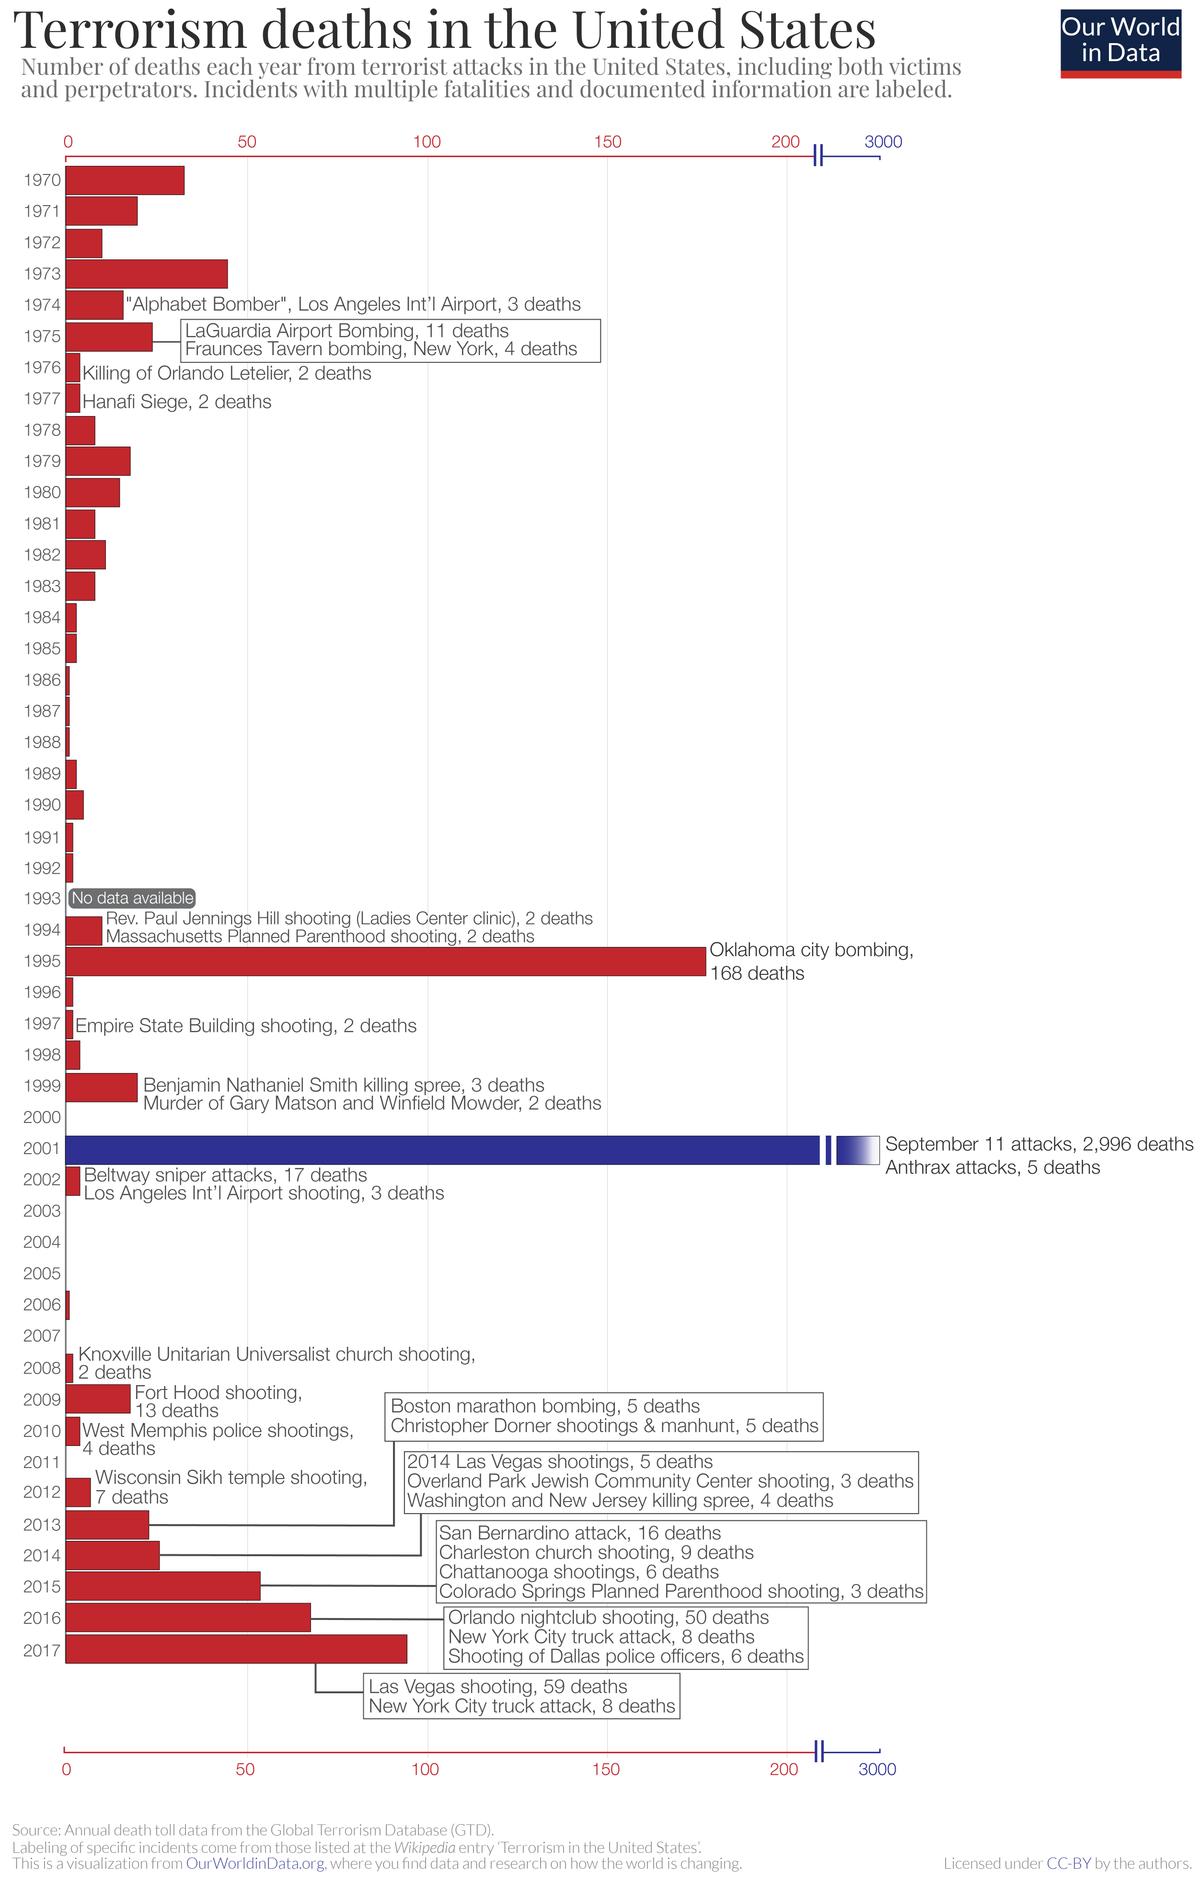 Terrorism in the United States - Wikipedia